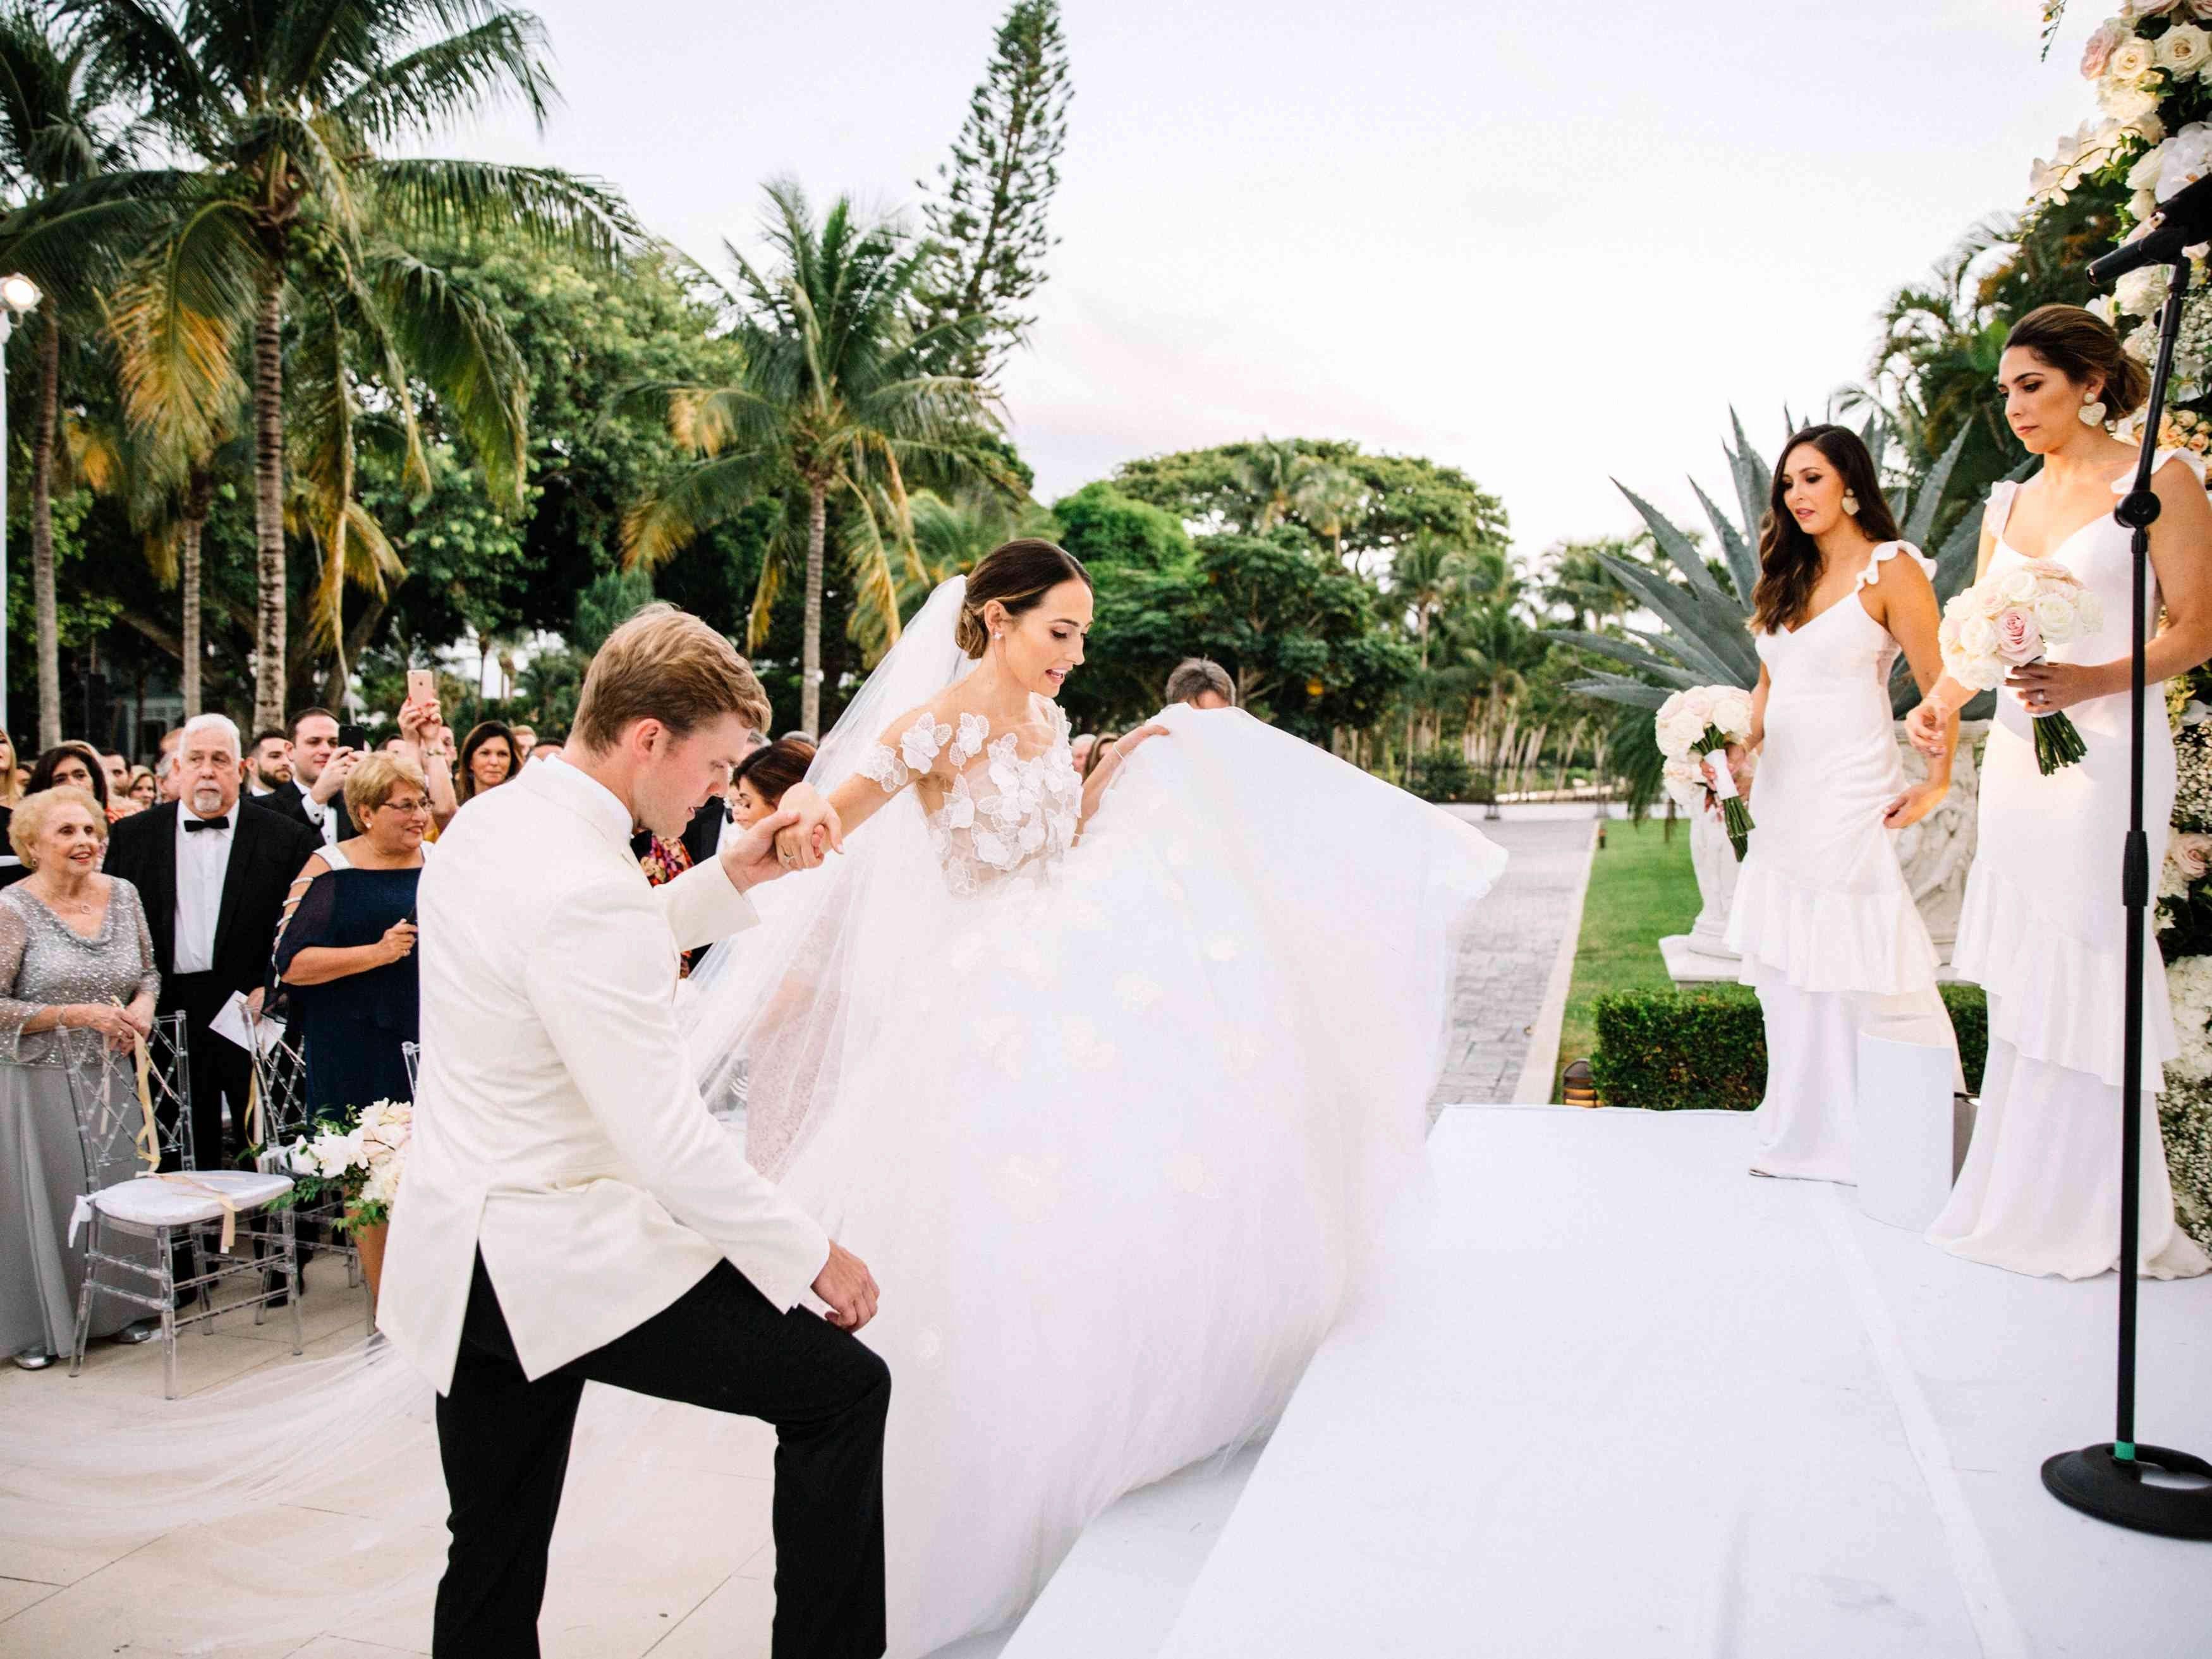 Wedding Dress Stores In Atlanta Ga Inspirational E Couple S Grand Palm Beach Wedding At The In 2020 Beach Wedding White White Beach Wedding Dresses Blue Beach Wedding